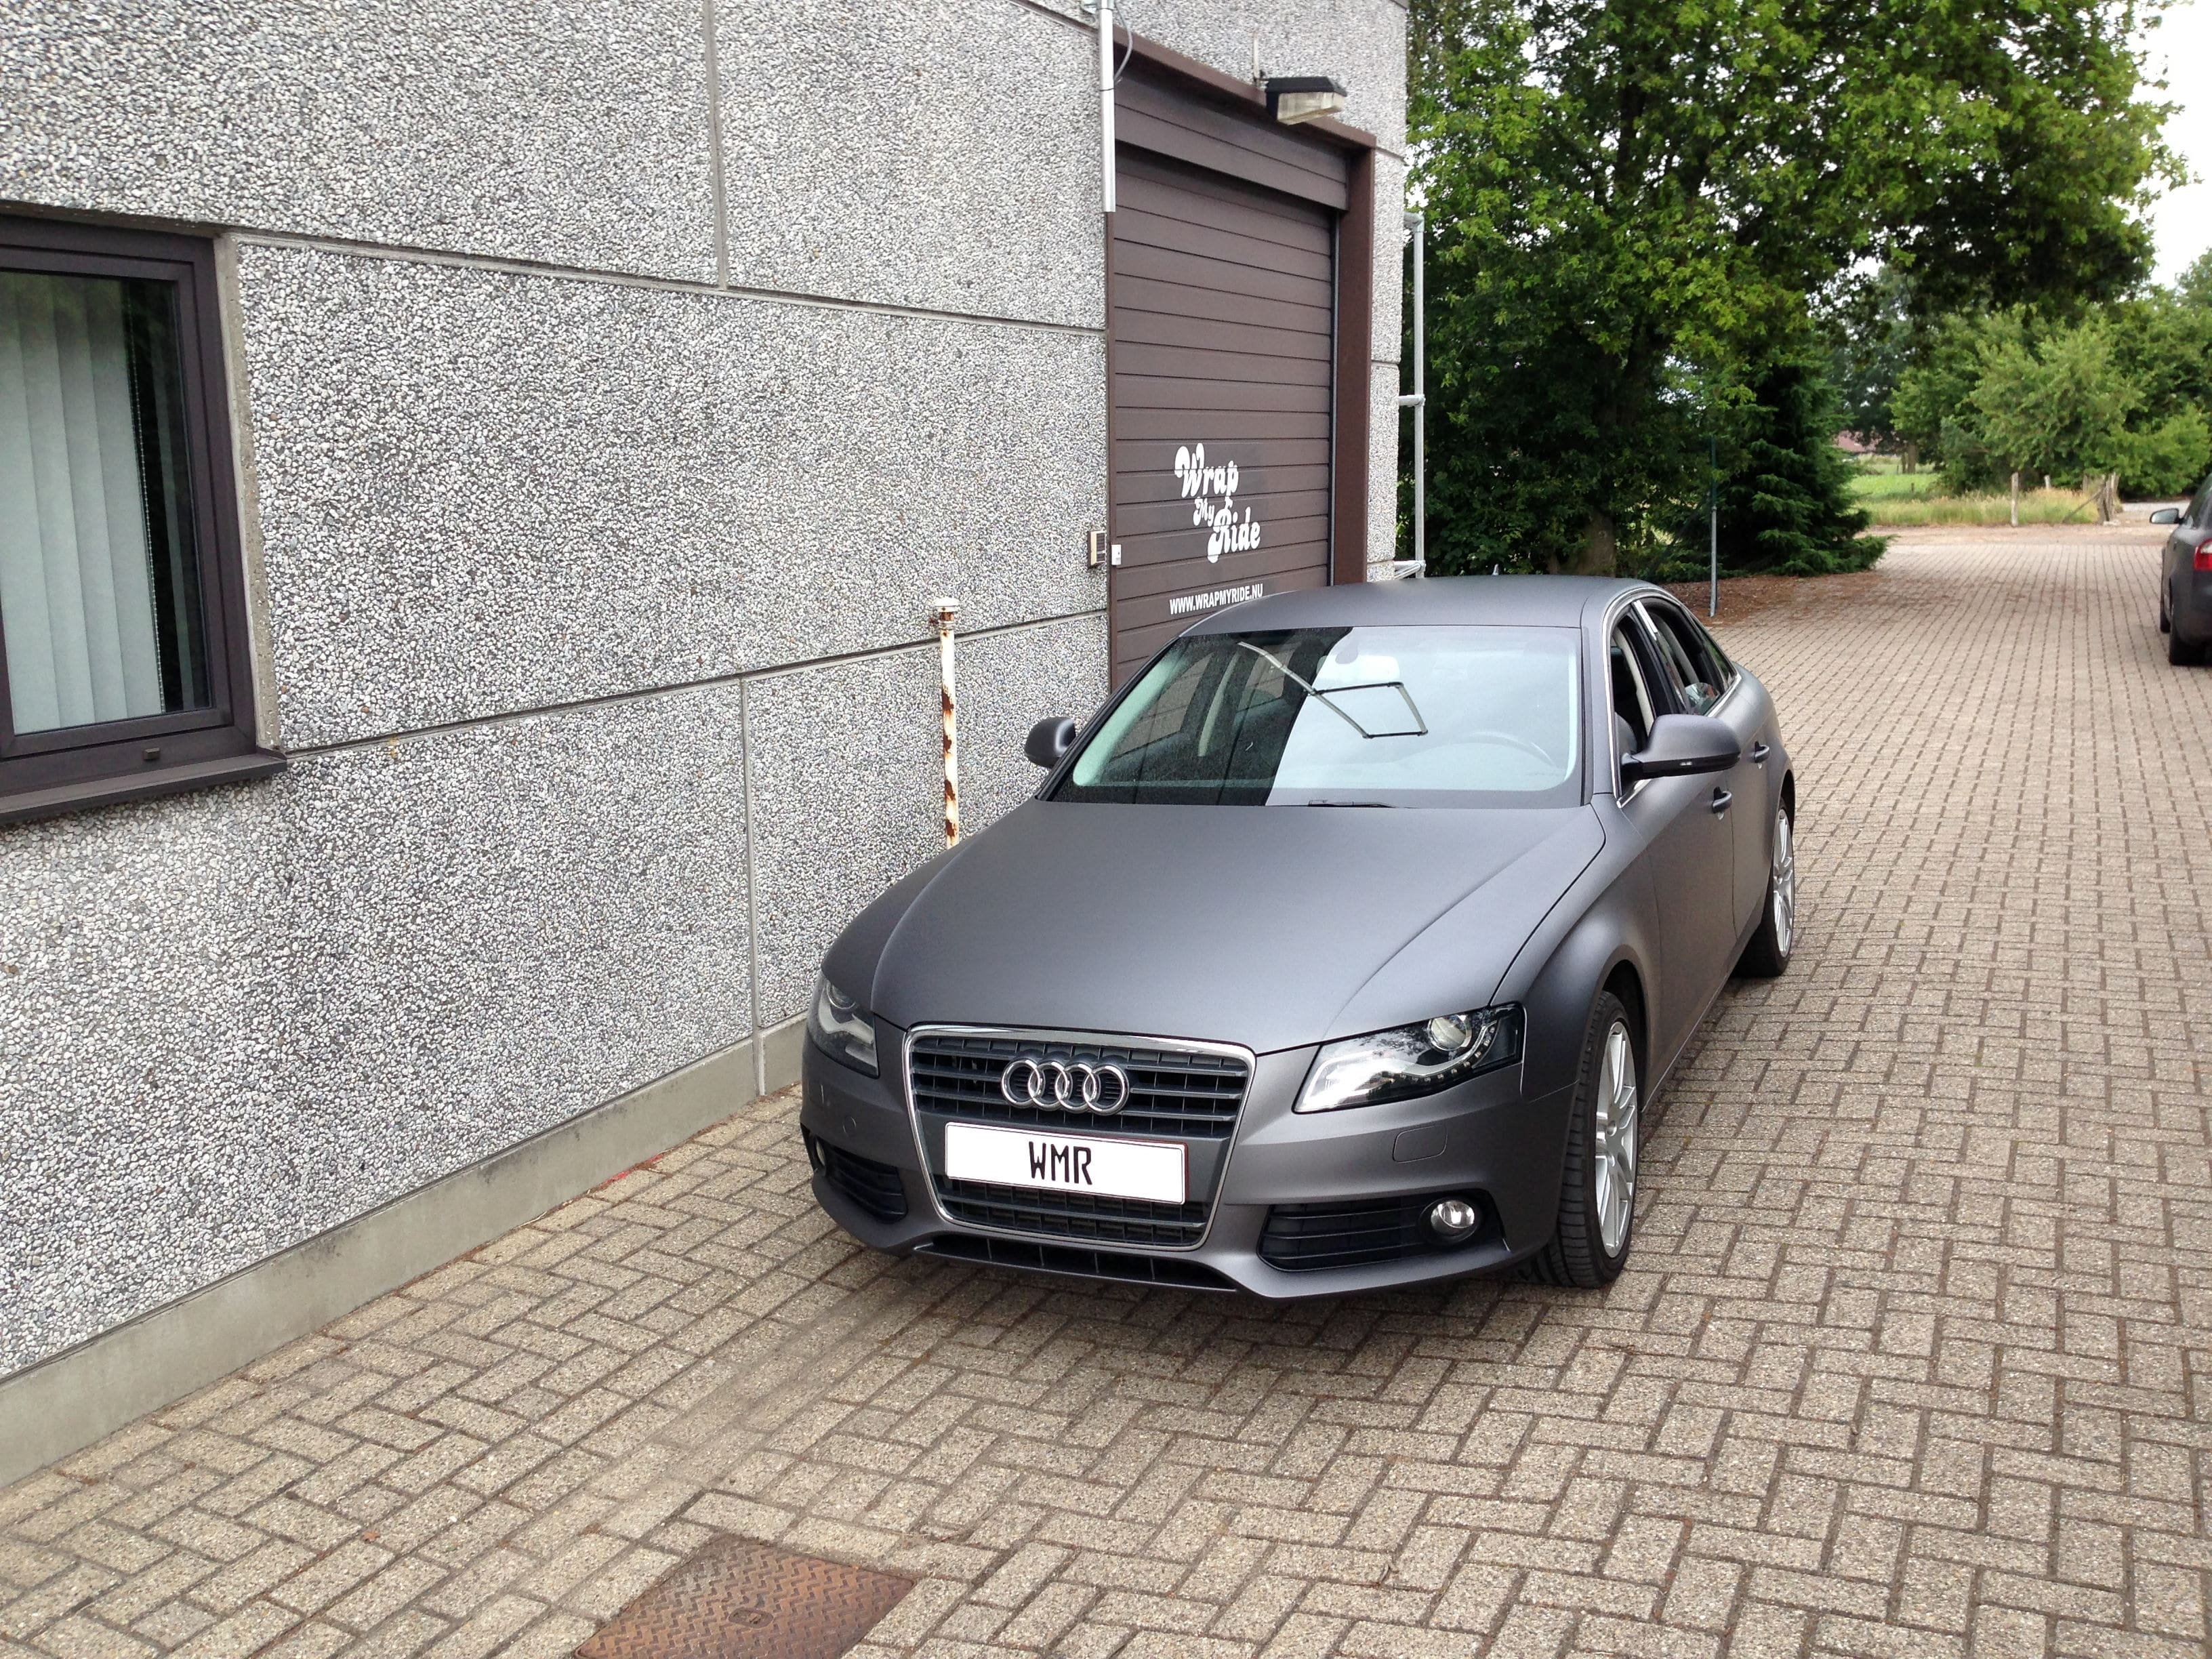 Audi A4 B6 met Gunpowder Wrap, Carwrapping door Wrapmyride.nu Foto-nr:4508, ©2021